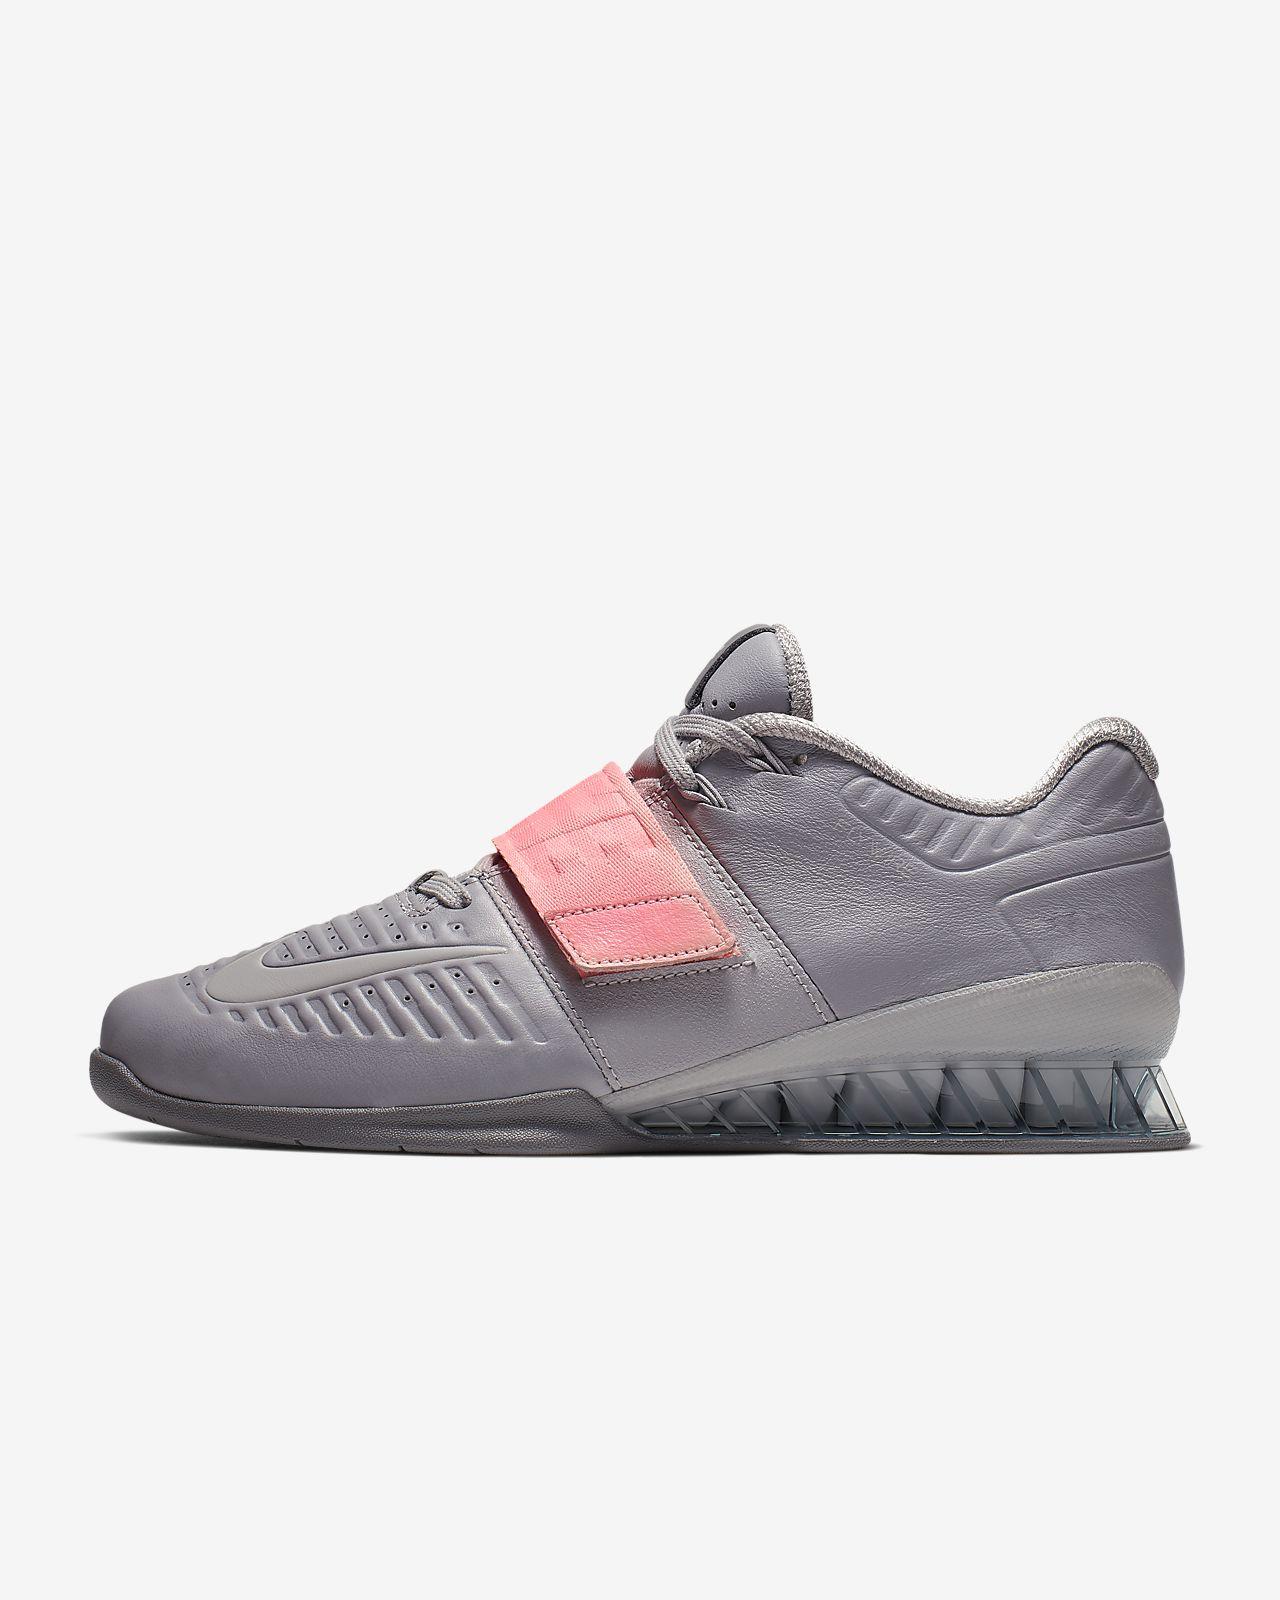 superior quality 11e27 919e3 Training Shoe. Nike Romaleos 3 XD